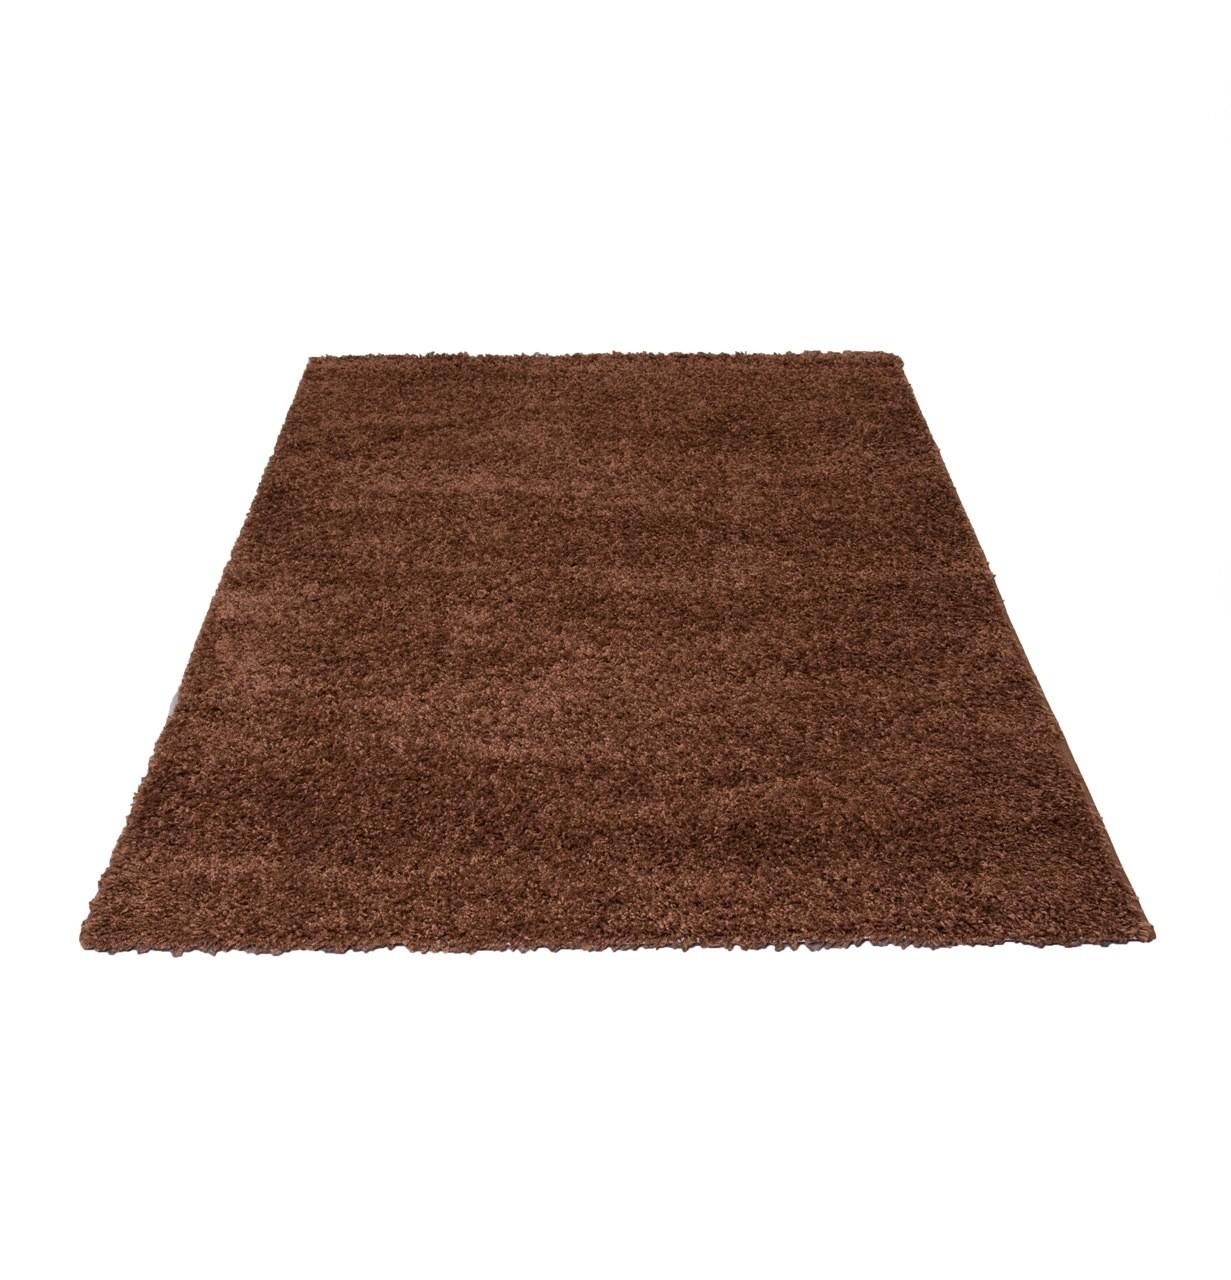 teppich taupe einfarbig 160x230 cm hochflor klick vinyl. Black Bedroom Furniture Sets. Home Design Ideas